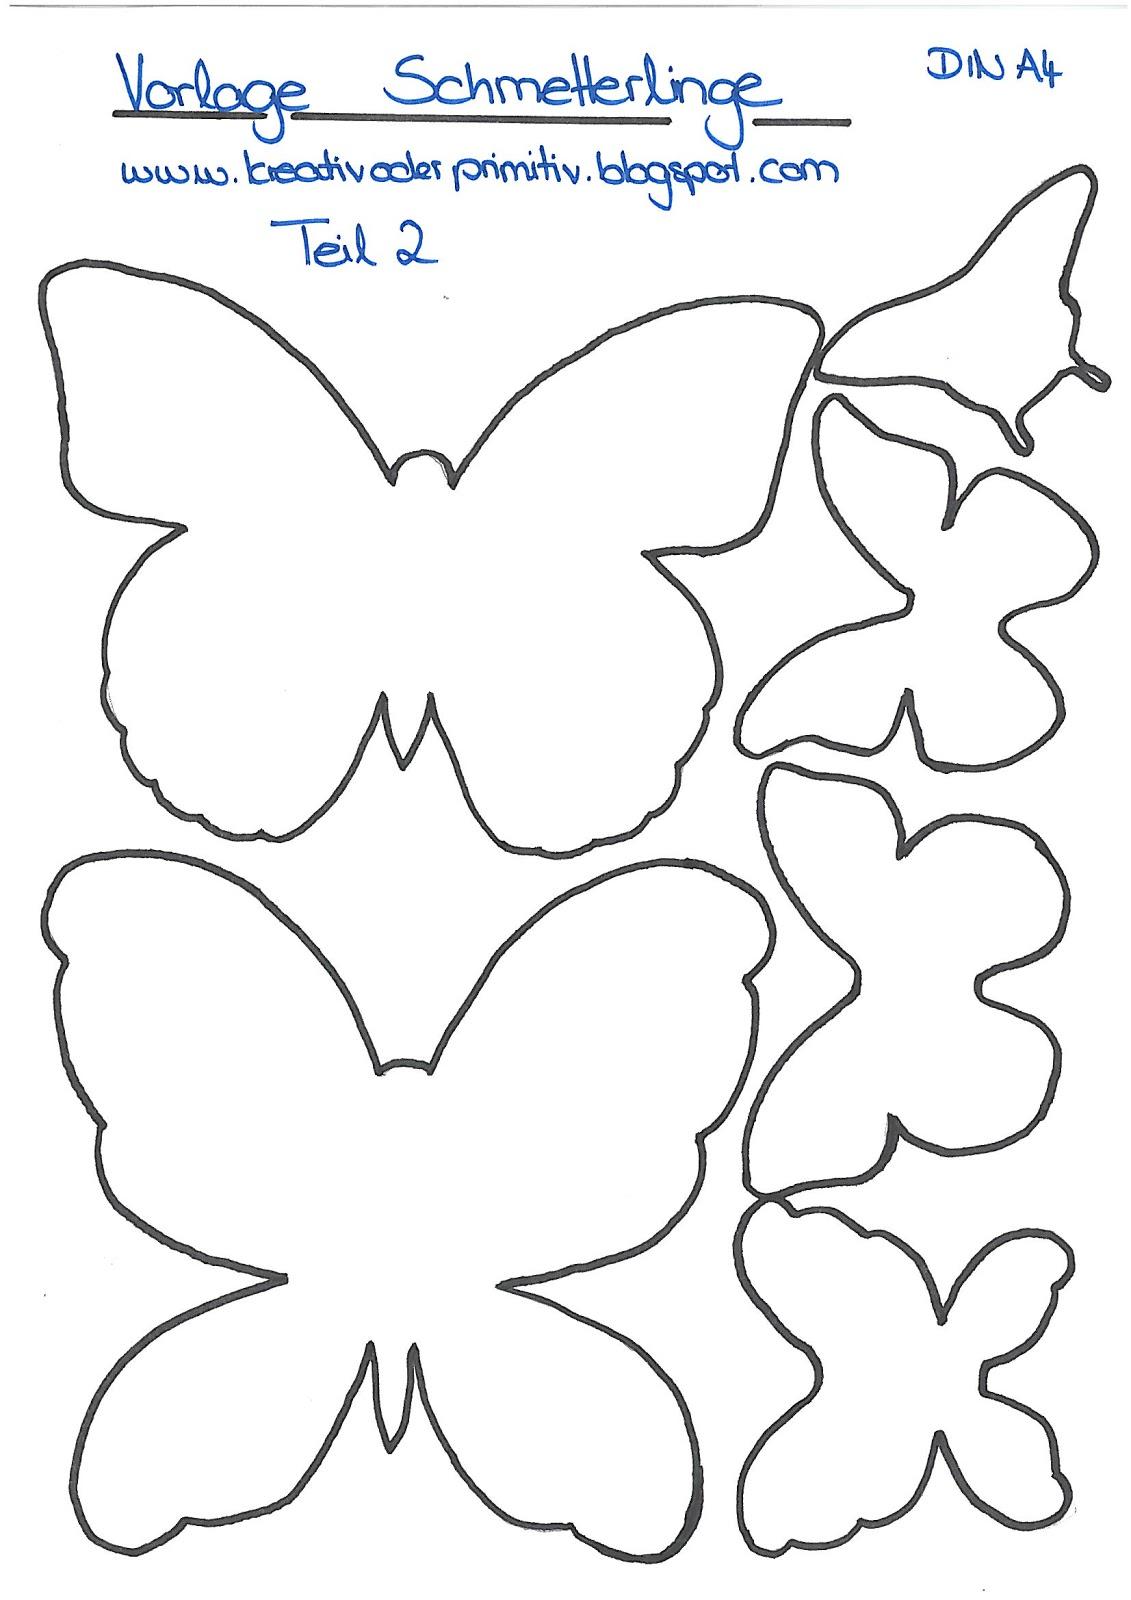 Kreativ Oder Primitiv?: Schmetterling-Collage über Schmetterlinge Vorlagen